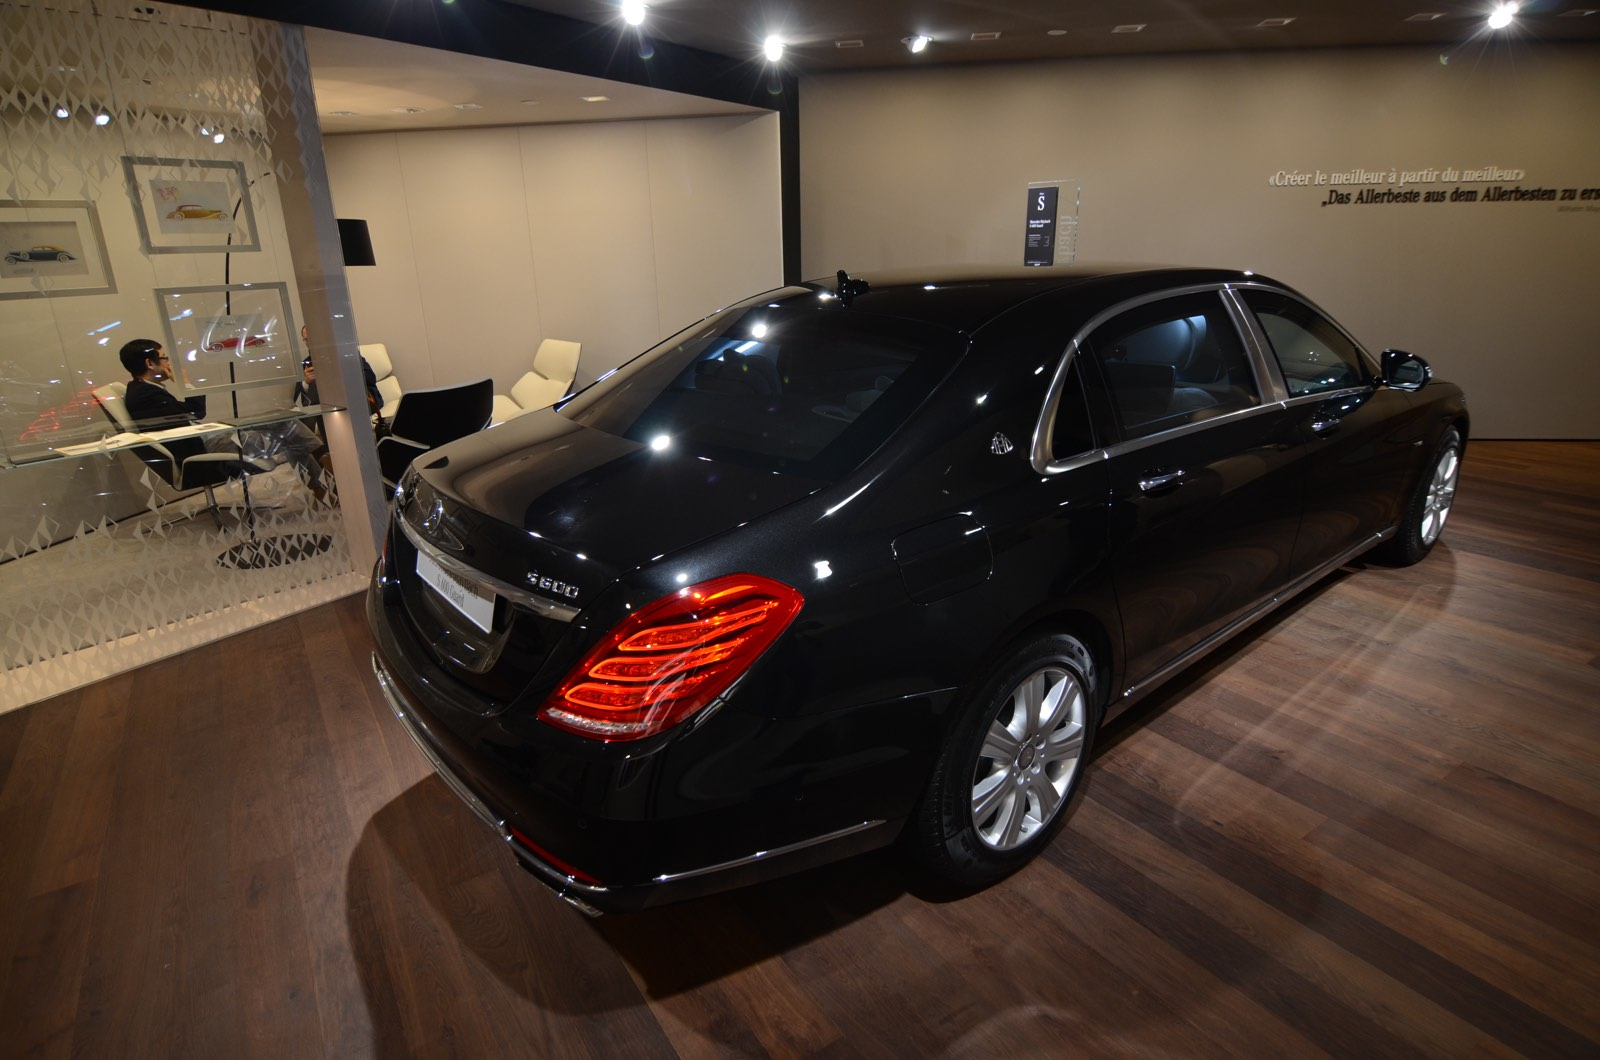 https://storage.googleapis.com/gtspirit/uploads/2016/03/Mercedes-Maybach-S-600-Guard-at-Geneva-Motor-Show-20164.jpg